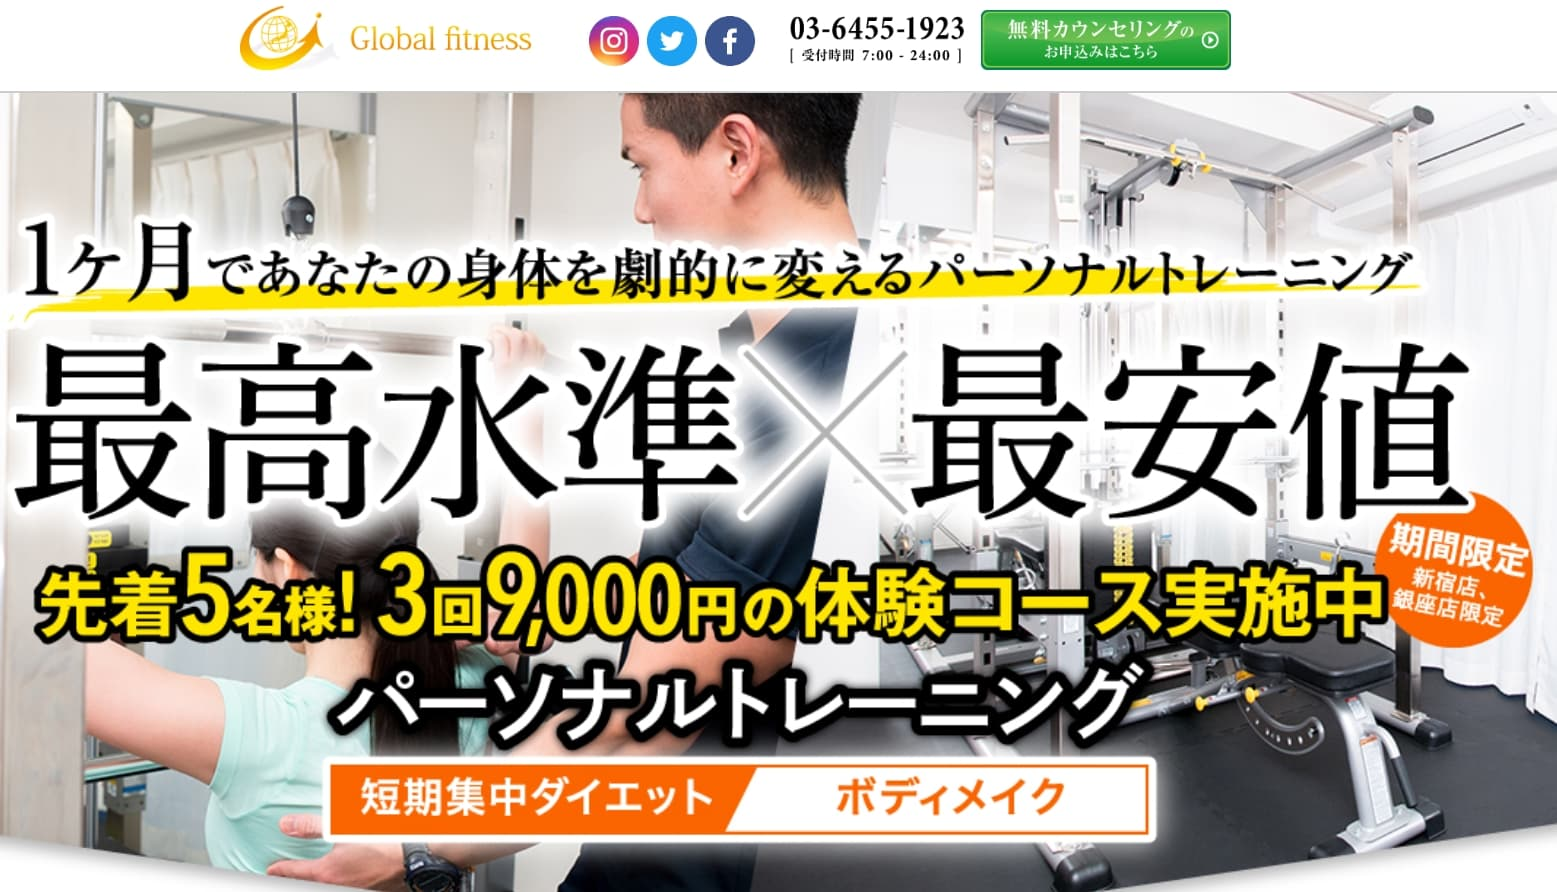 Global fitness |横浜駅周辺のパーソナルトレーニングジム